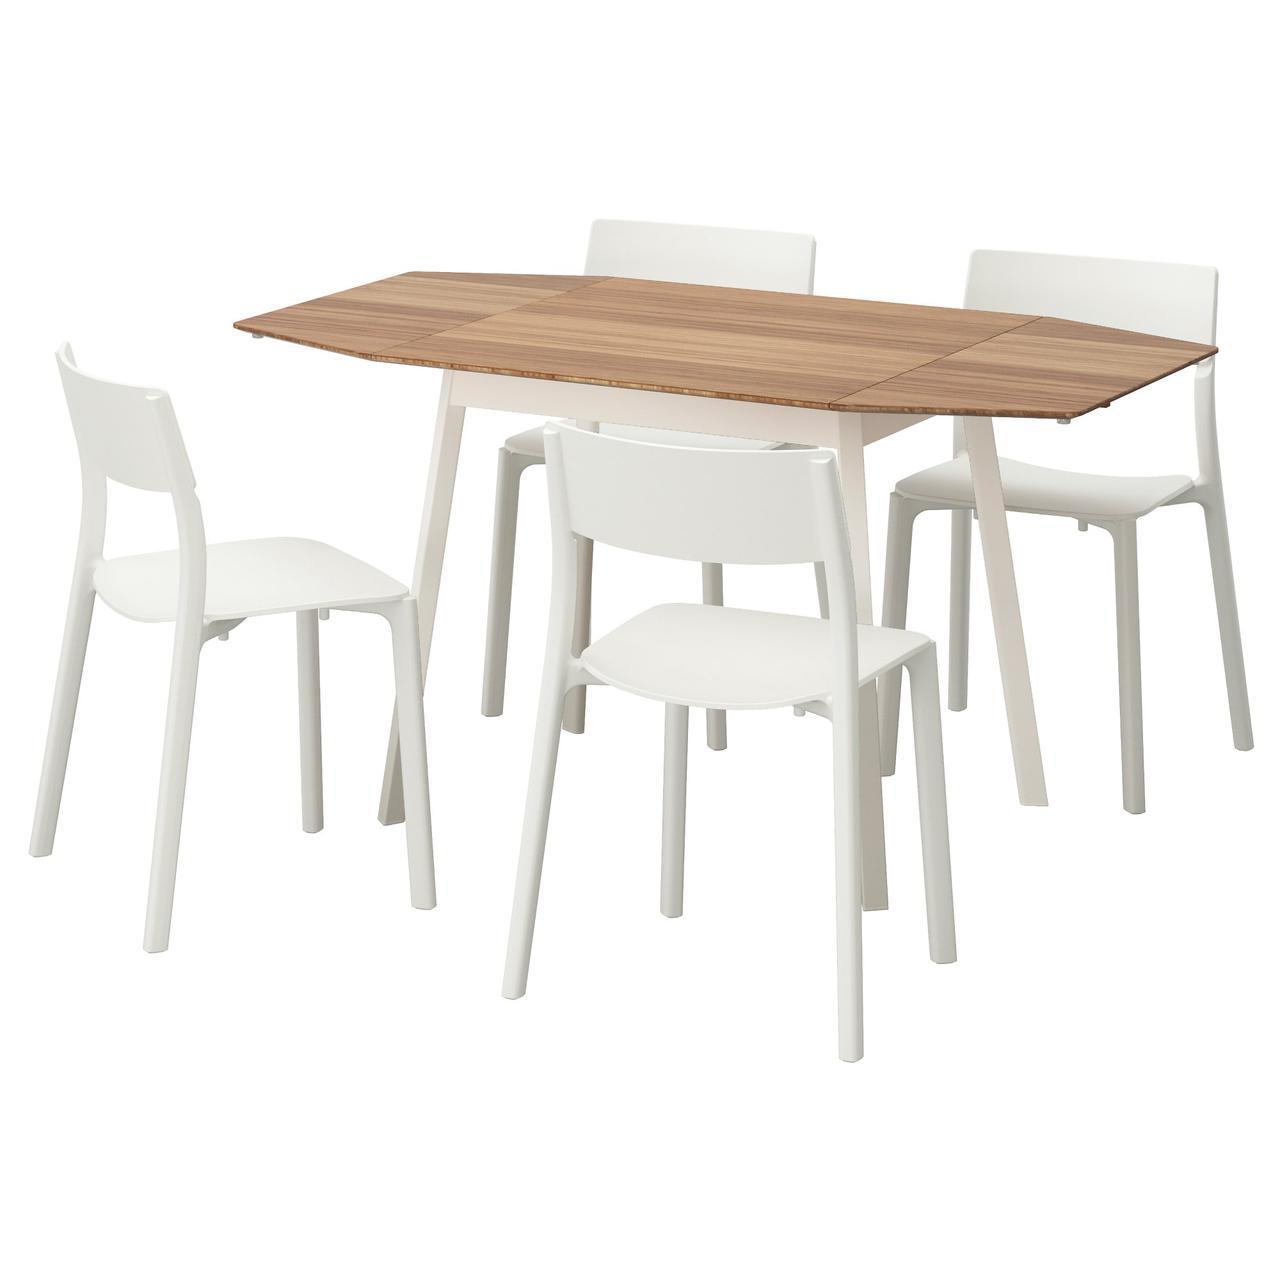 ✅ IKEA IKEA PS 2012 / JANINGE (691.614.82) Стол и 4 стула, бамбук